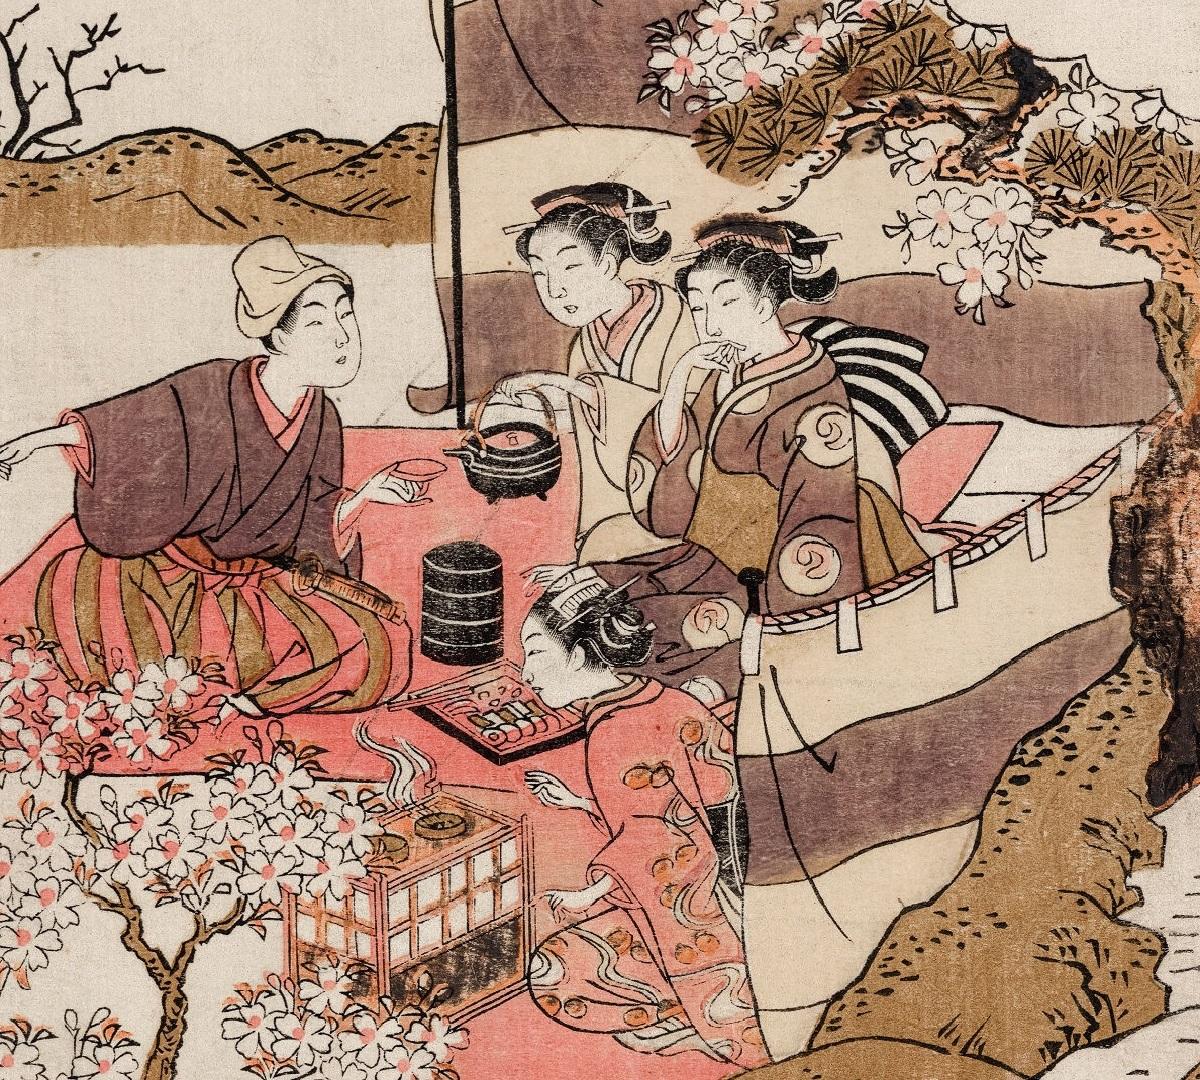 A wood cut print by Kitao Shigemasa from 1772 of Japanese women eating a picnic